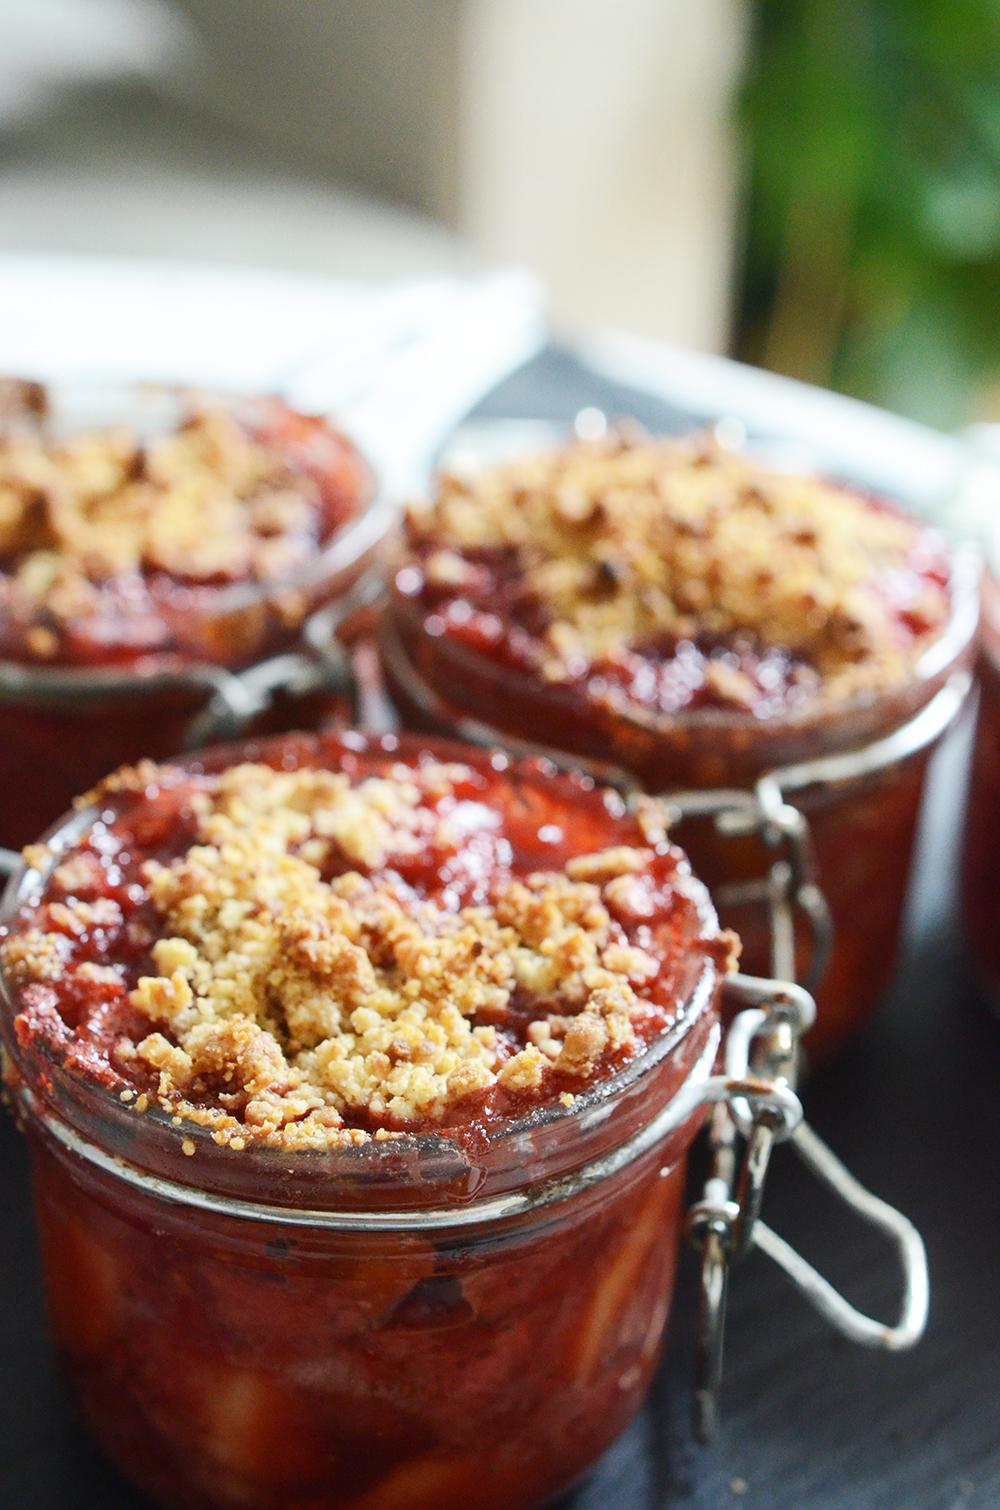 crumble_fruitsrouges_pommes_recette_fernandeetrene_DSC_9302 copie